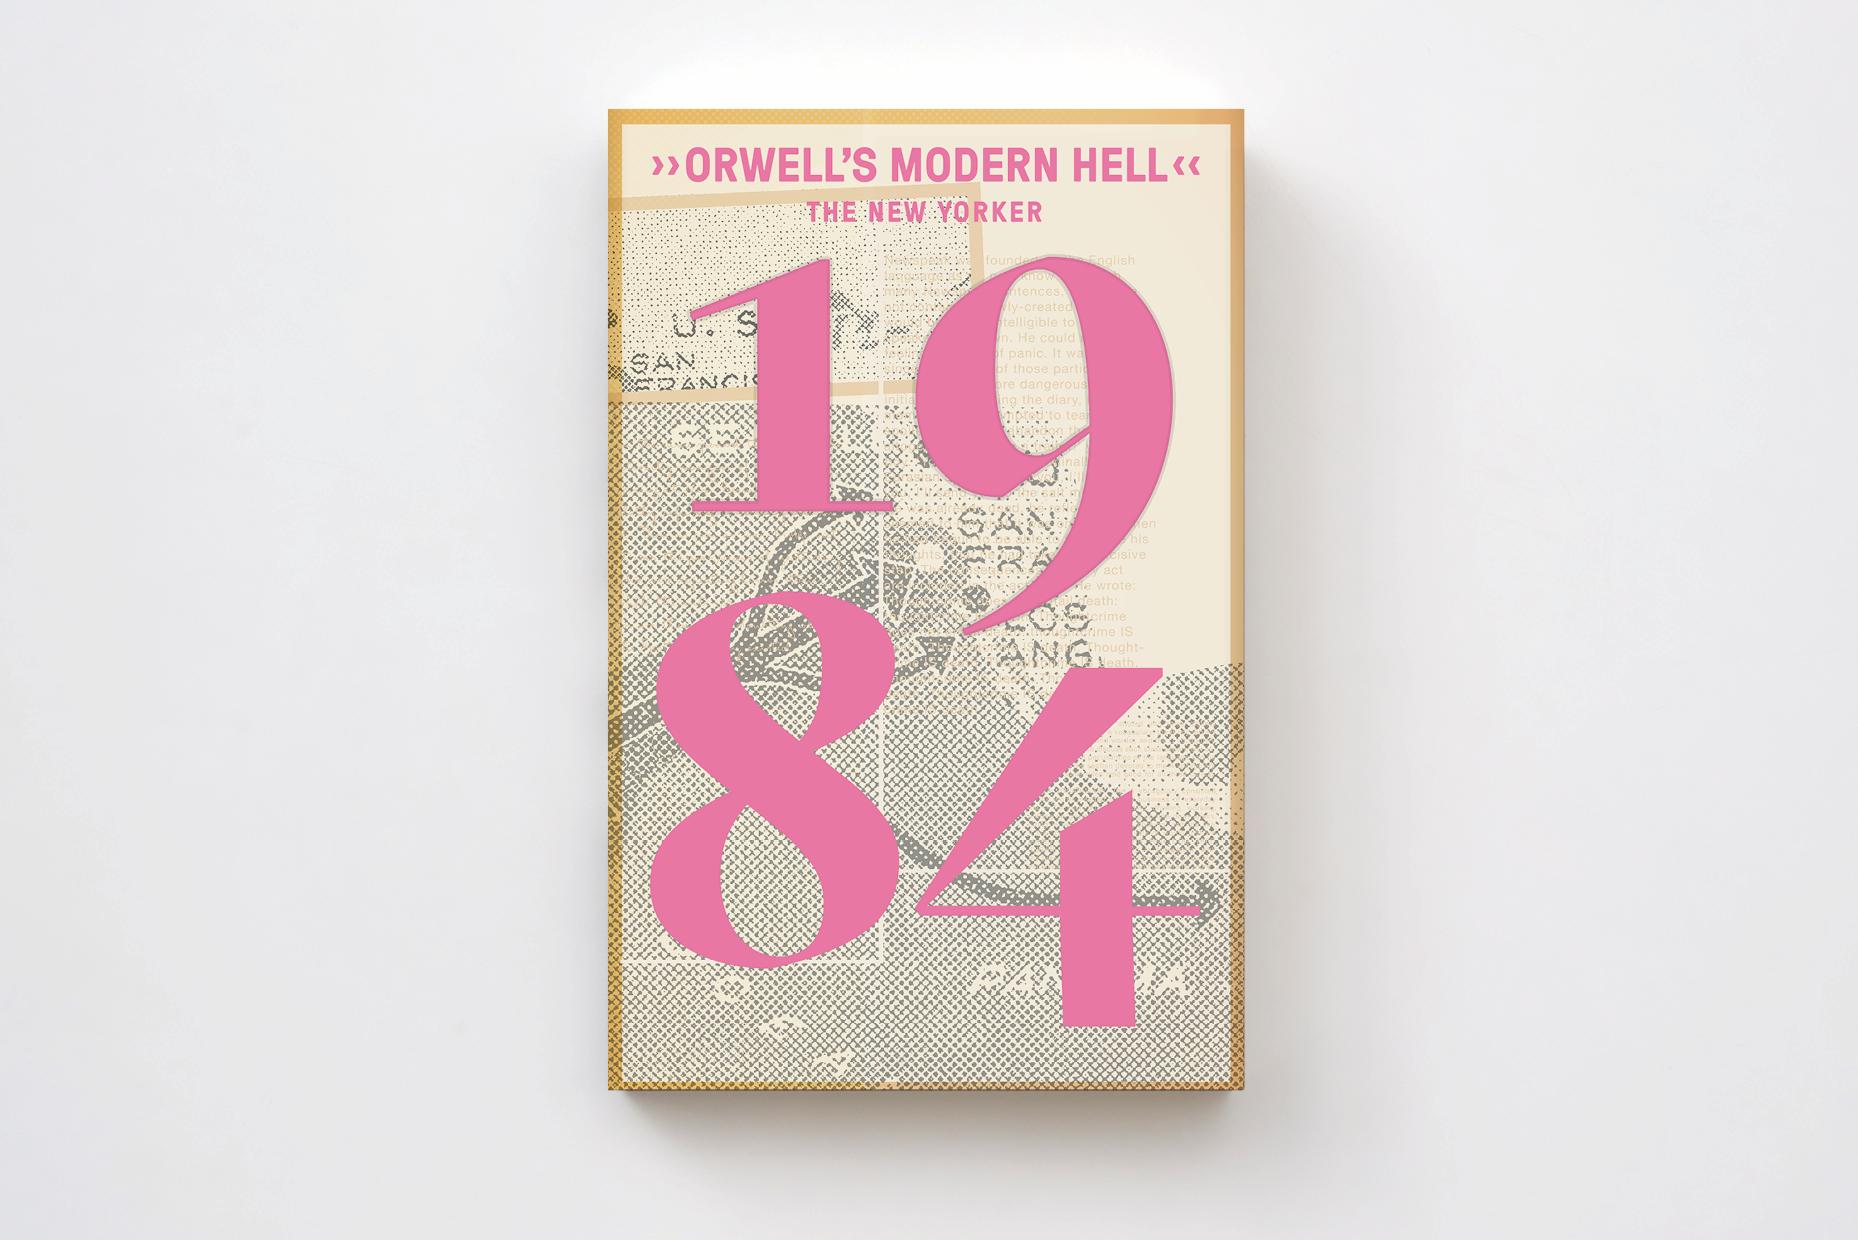 1984-Cover-150dpi_Max.jpg